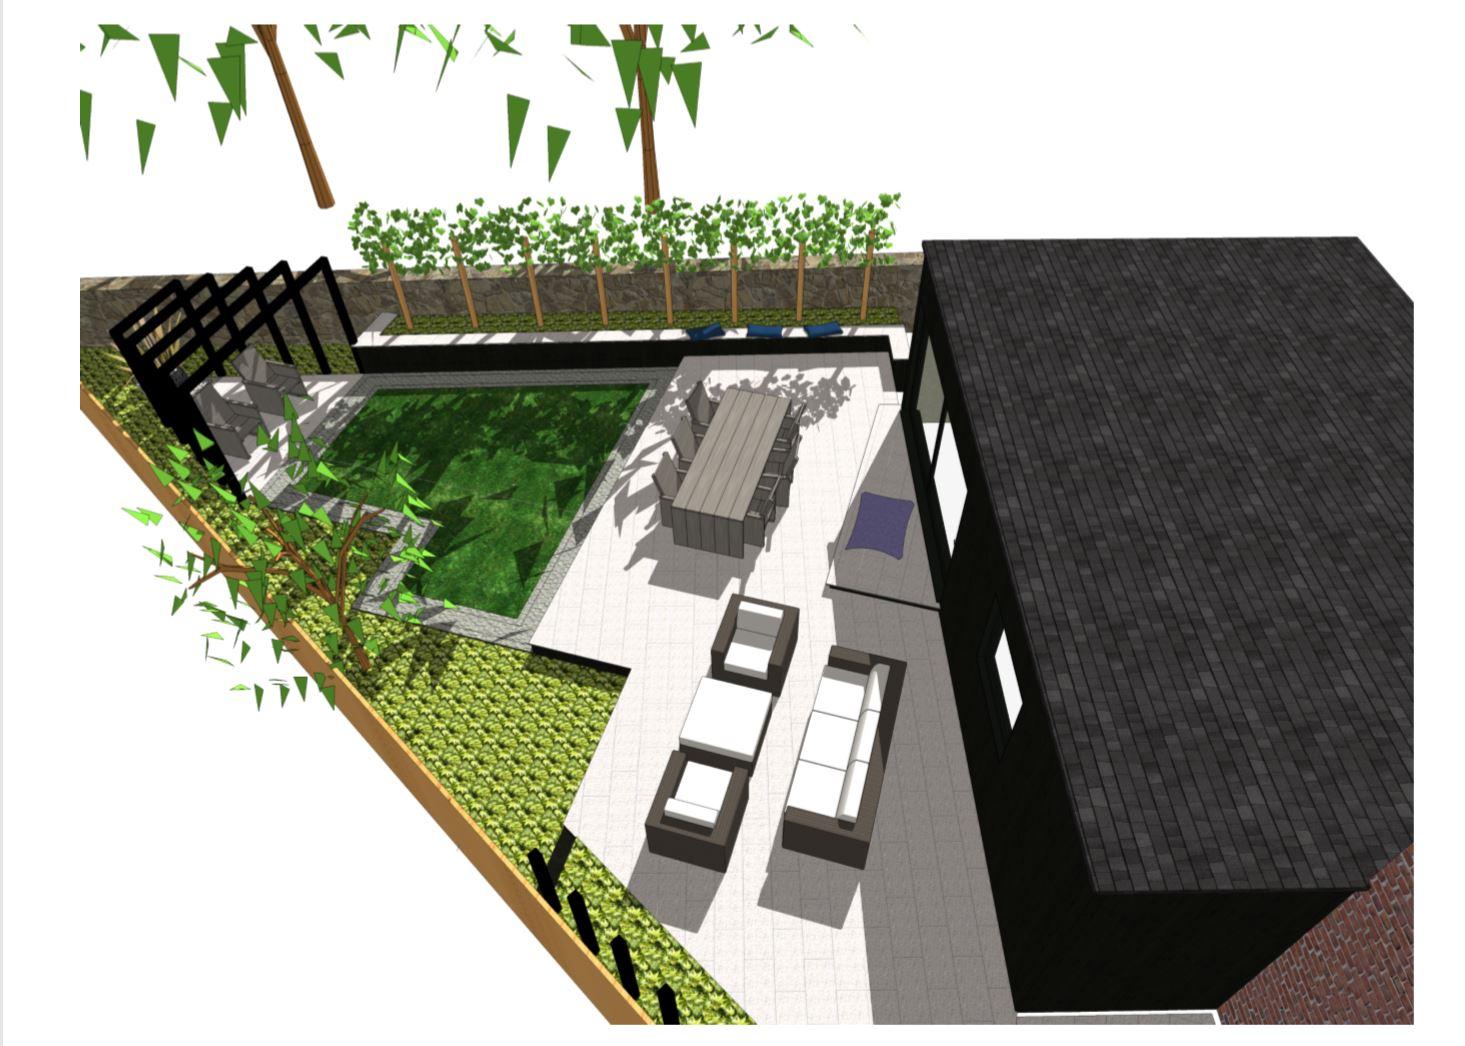 1, Overview of a garden design in Stanley, Wakefield